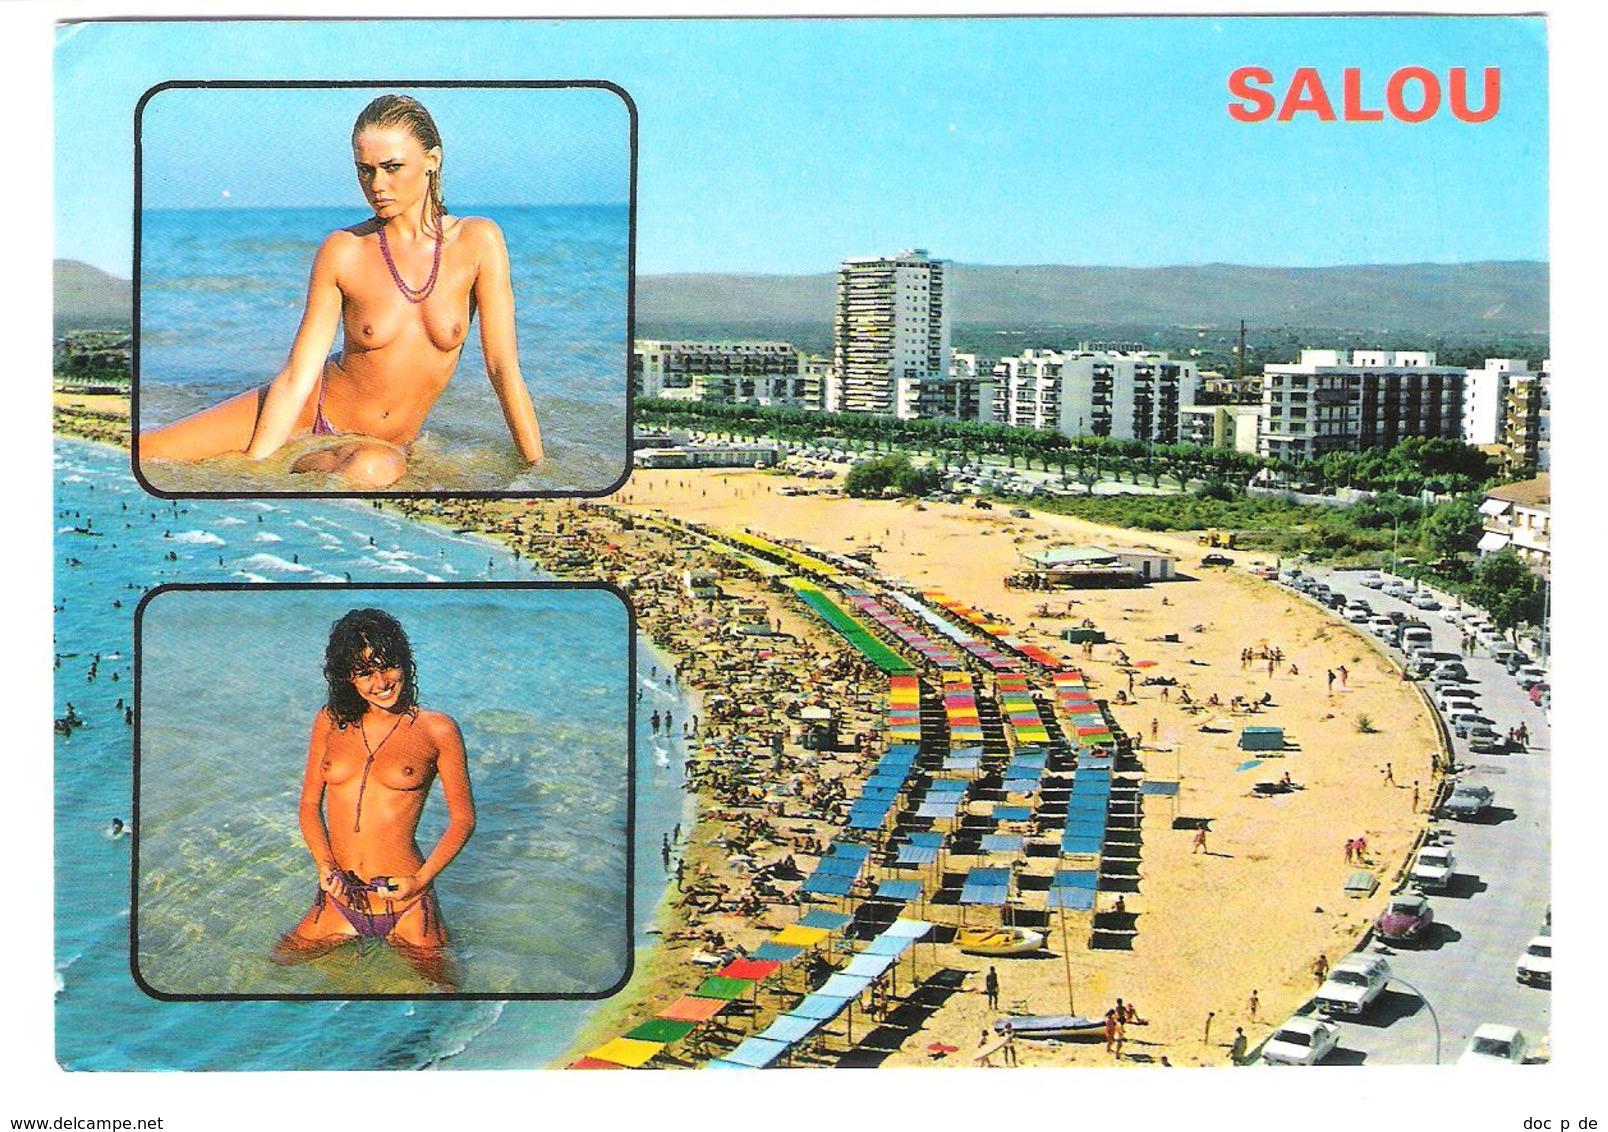 Spain - PIN UP - Femme - Nue Girl - Woman - Frau - Erotic - Erotik - Nackt - Pin-Ups